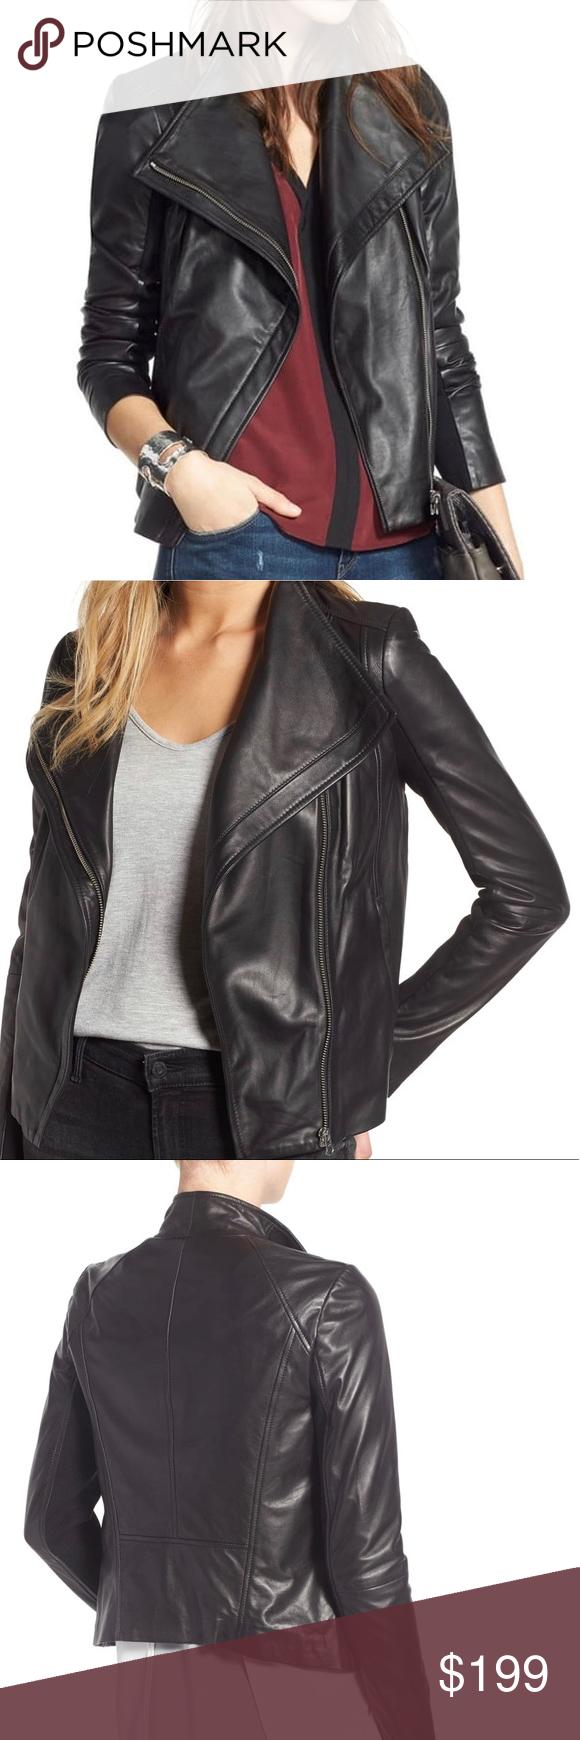 Trouve Chelsea28 Leather Moto Jacket Leather Moto Jacket Garment Labels Jackets [ 1740 x 580 Pixel ]